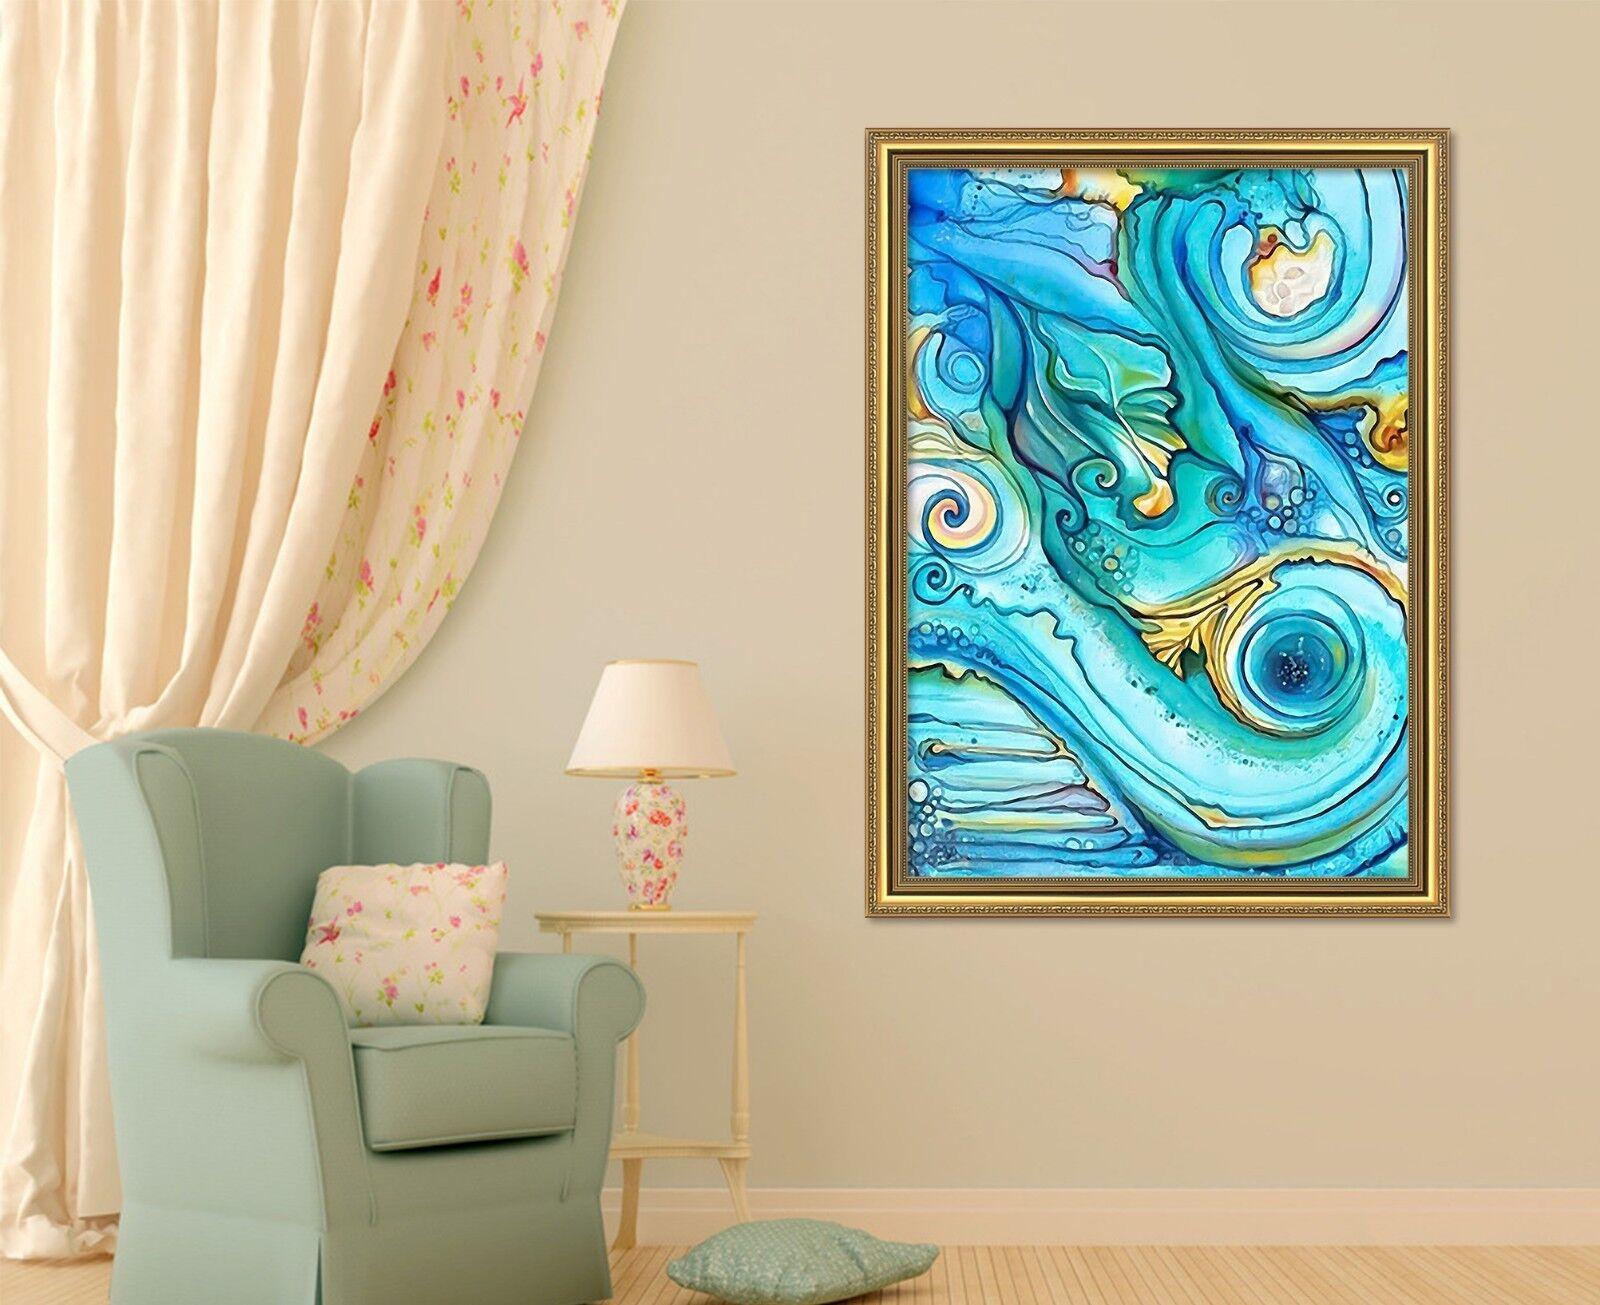 3D Bleu Peinture 69 Framed Poster Home Decor imprimer peinture art AJ UK